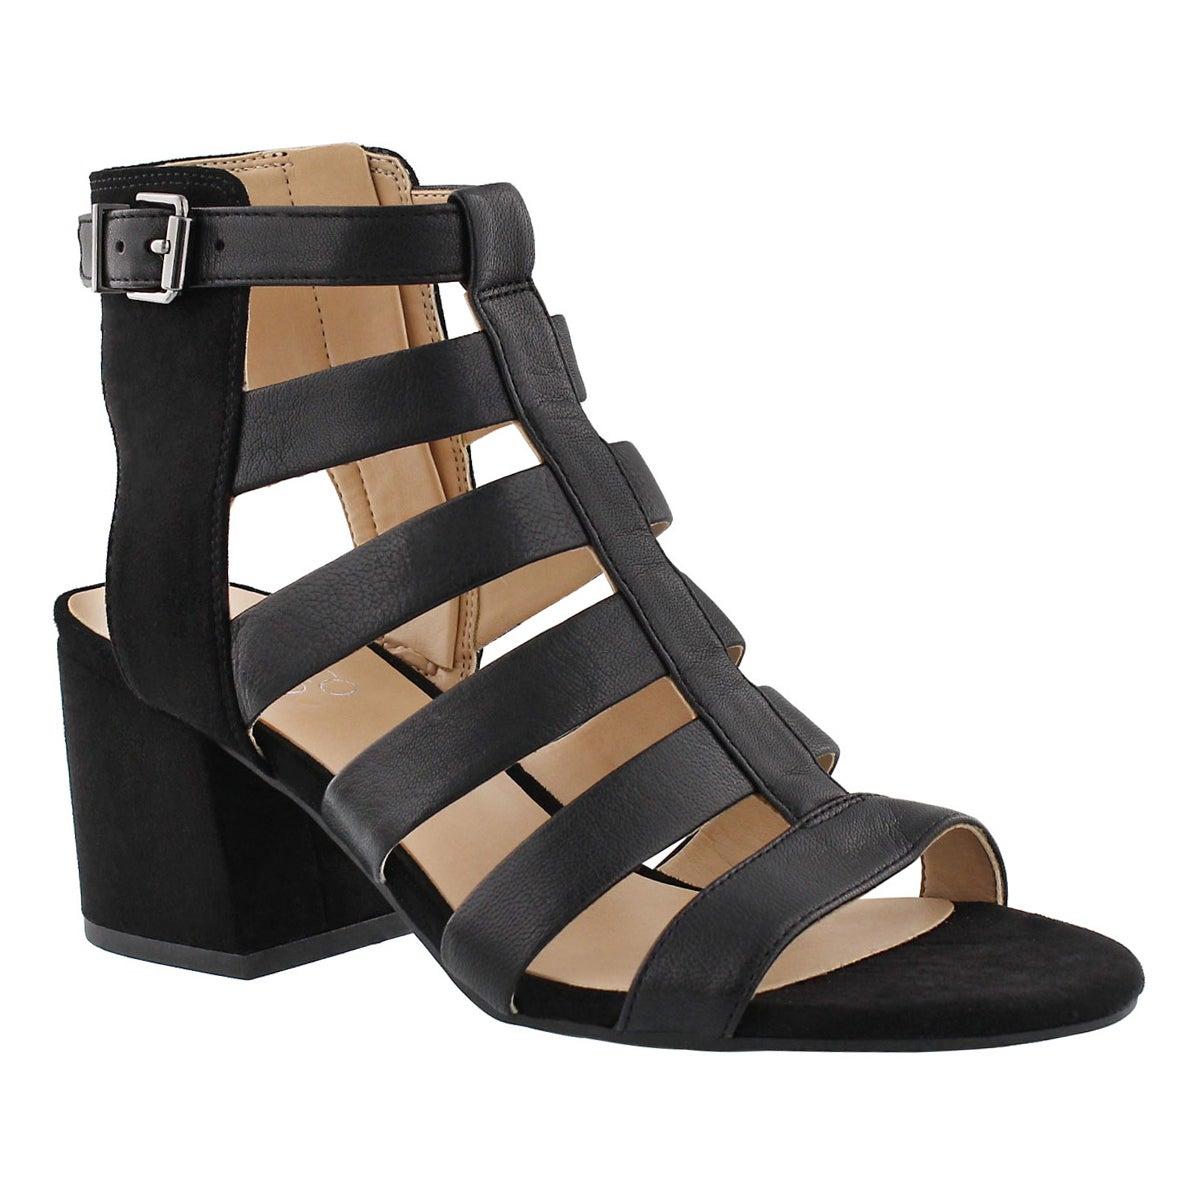 Women's MESA black dress sandals